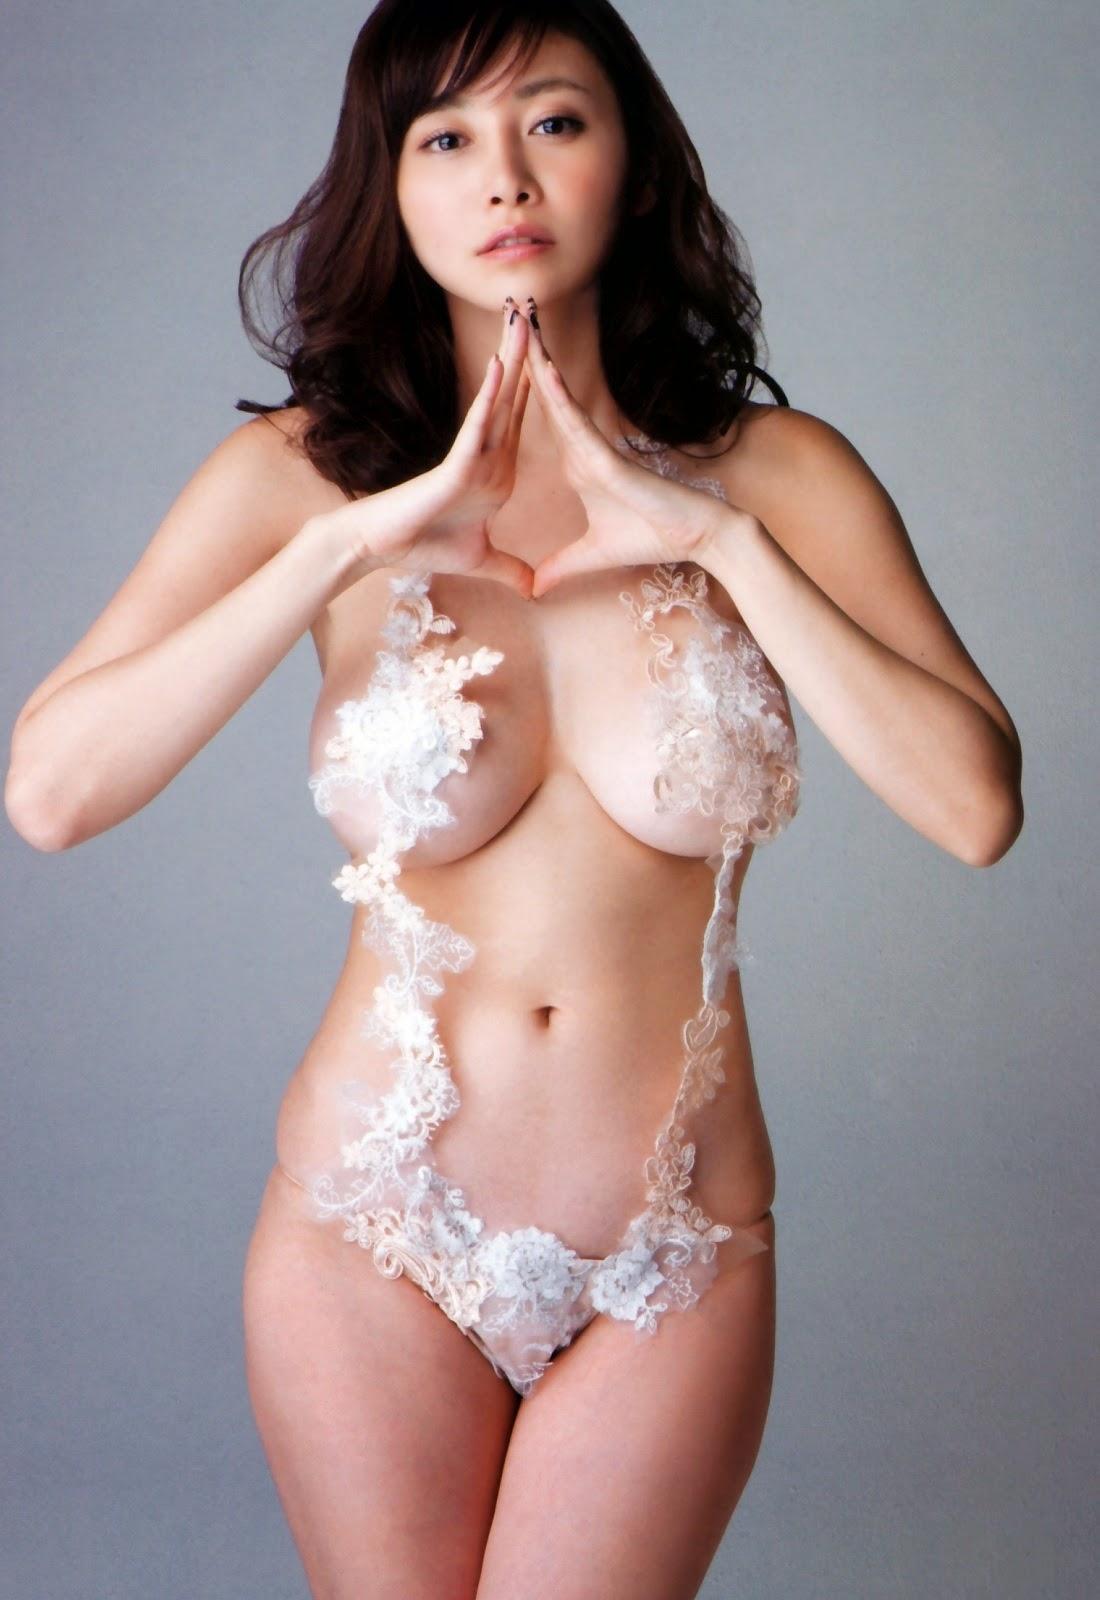 Anri Sugihara 杉原杏璃 Nude Naked Photos 5